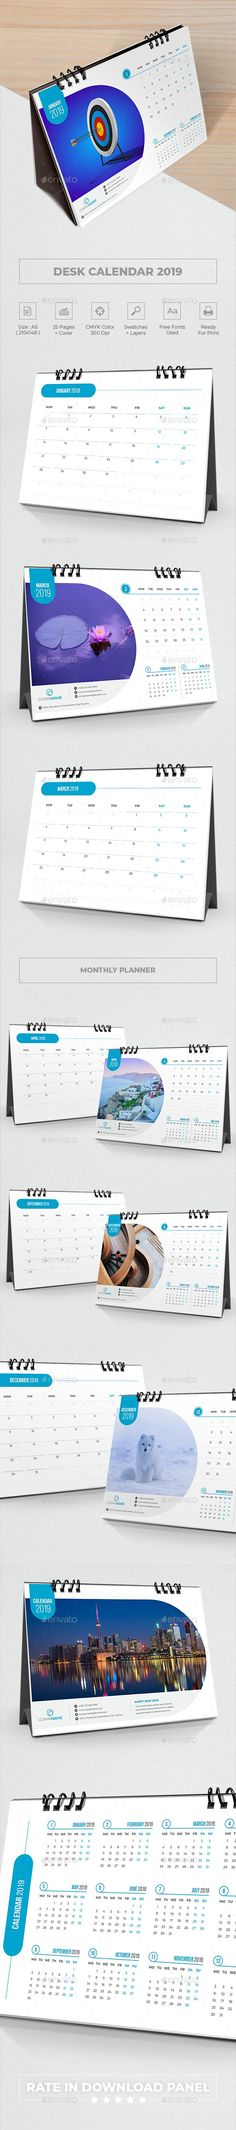 #Desk #Calendar 2019 #Planner - Calendars Stationery Calendar 2019 Planner, Office Calendar, Desk Calendars, Planner Template, Calendar Templates, Creative Calendar, Buy Desk, O Design, Designs To Draw